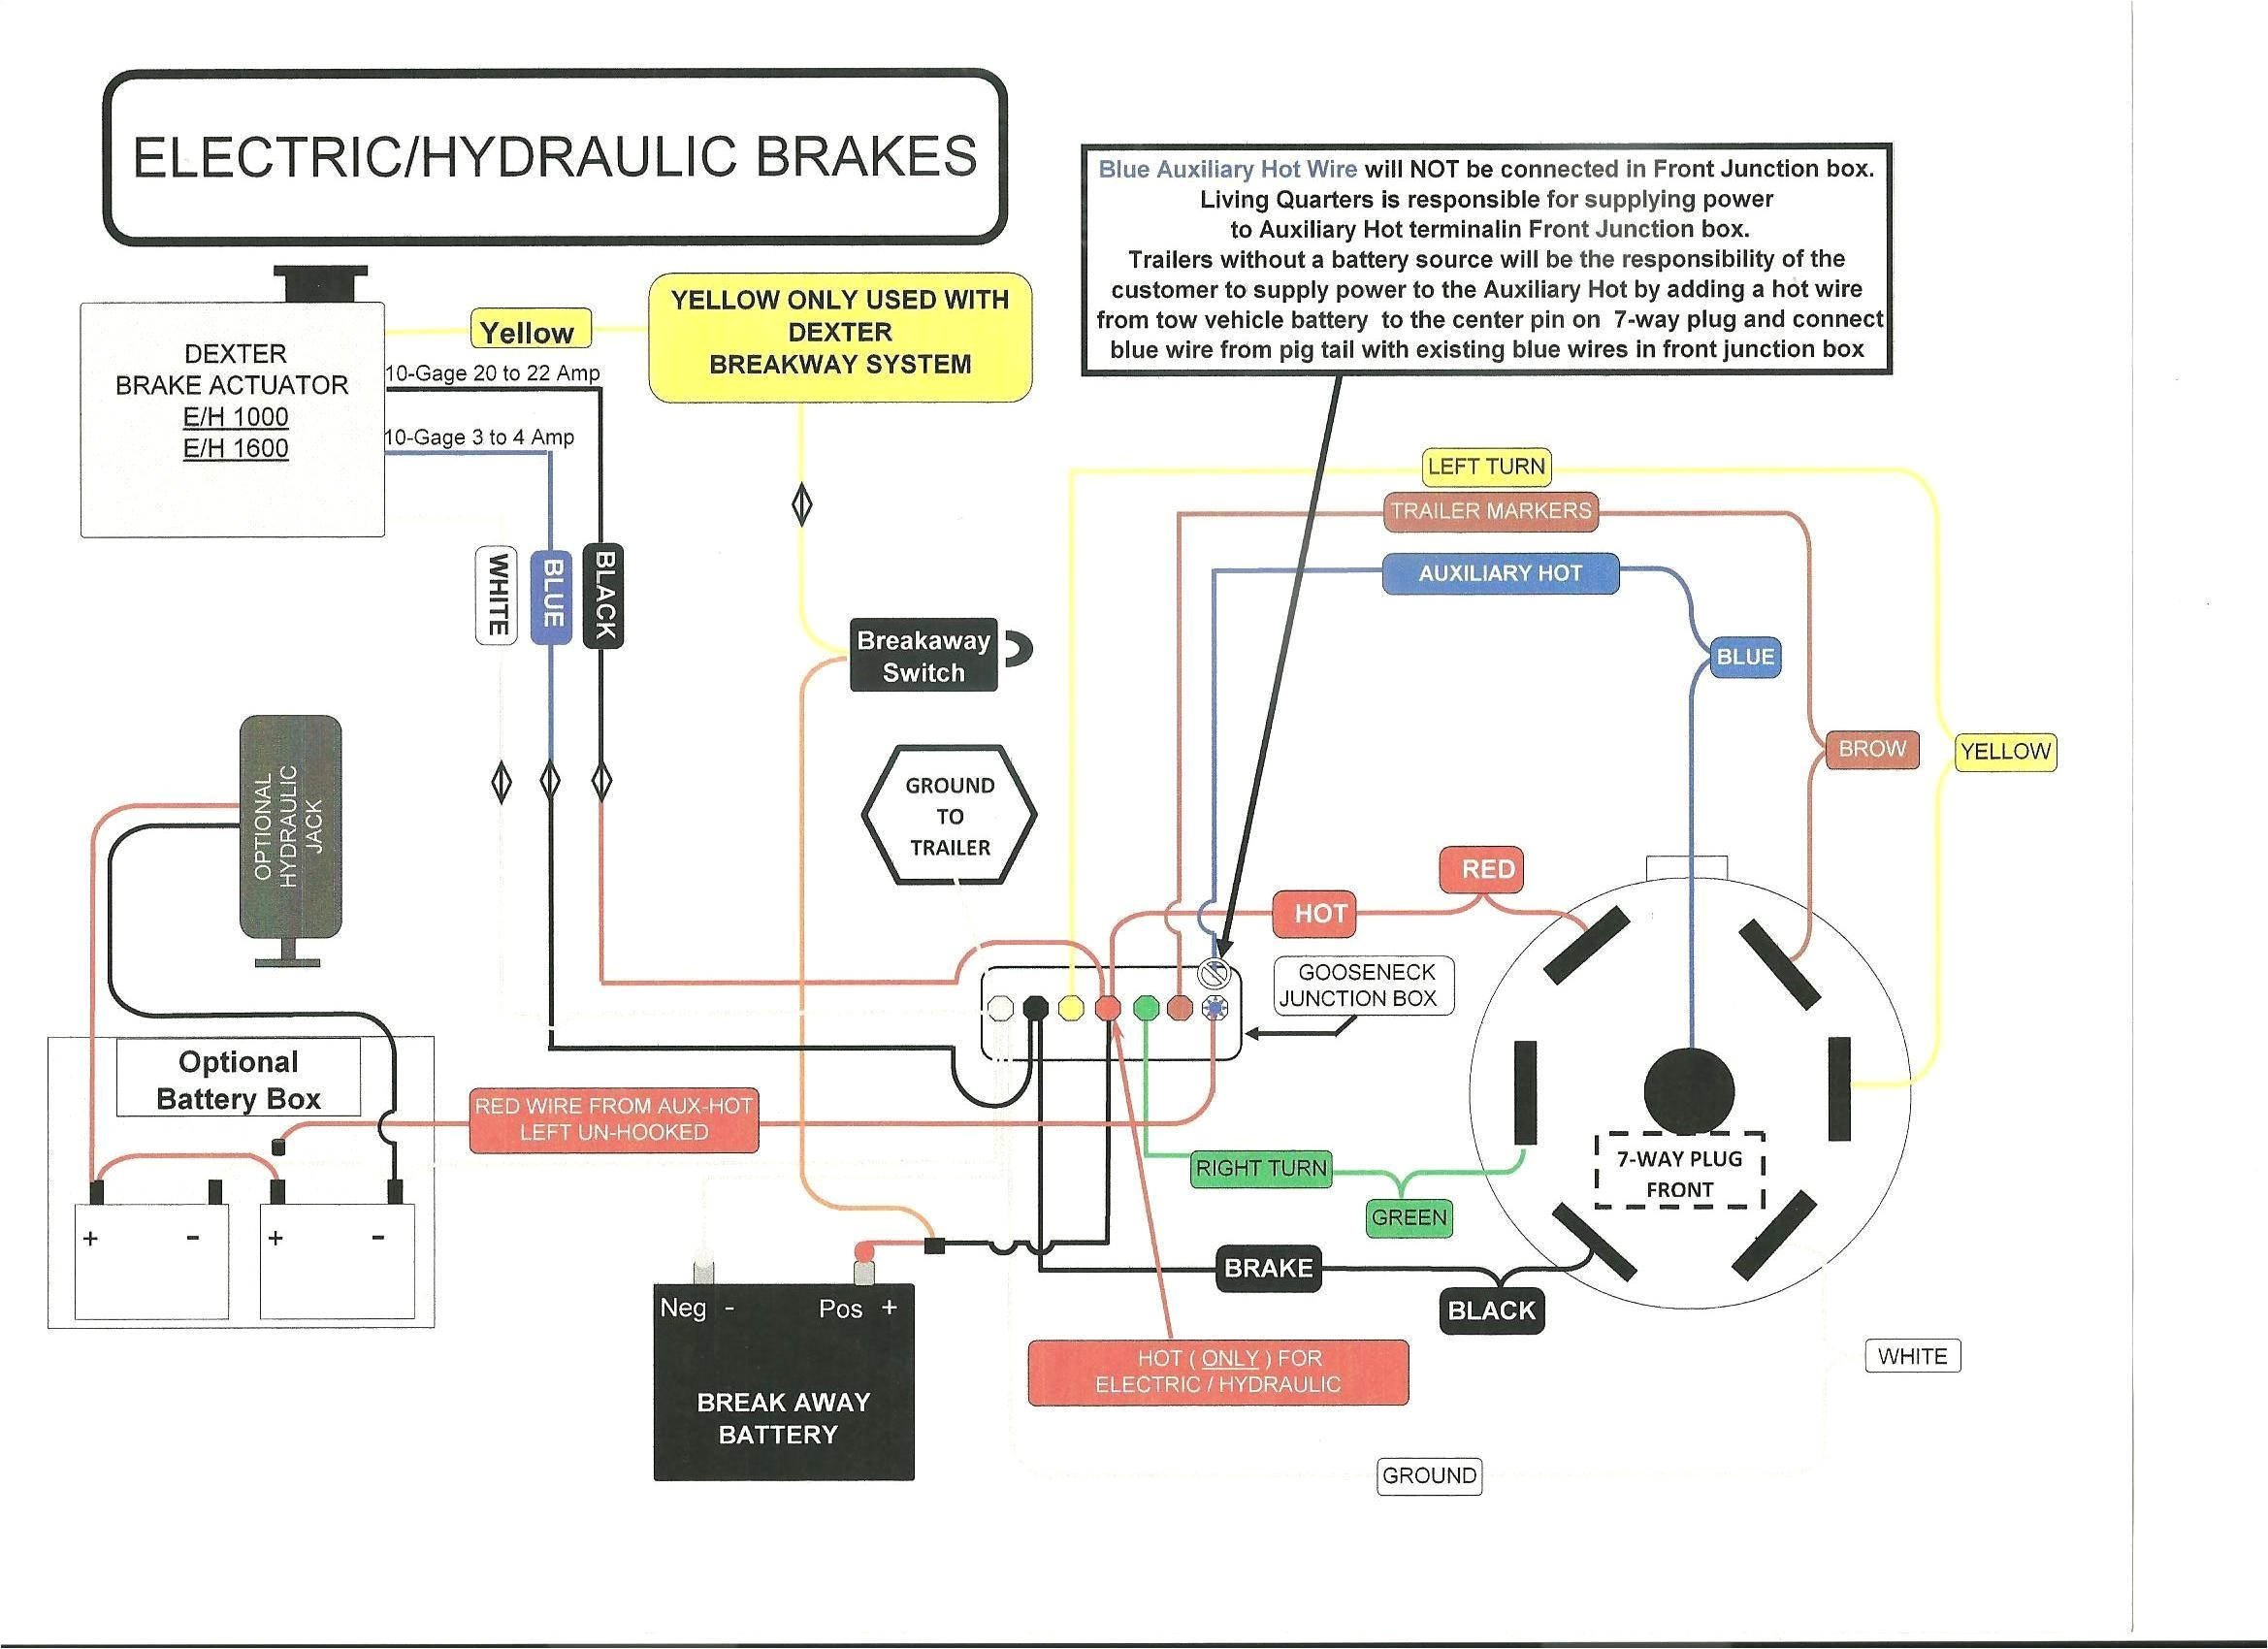 ram trailer wiring diagram wiring diagram inside 2015 dodge ram trailer wiring diagram ram trailer wiring diagram